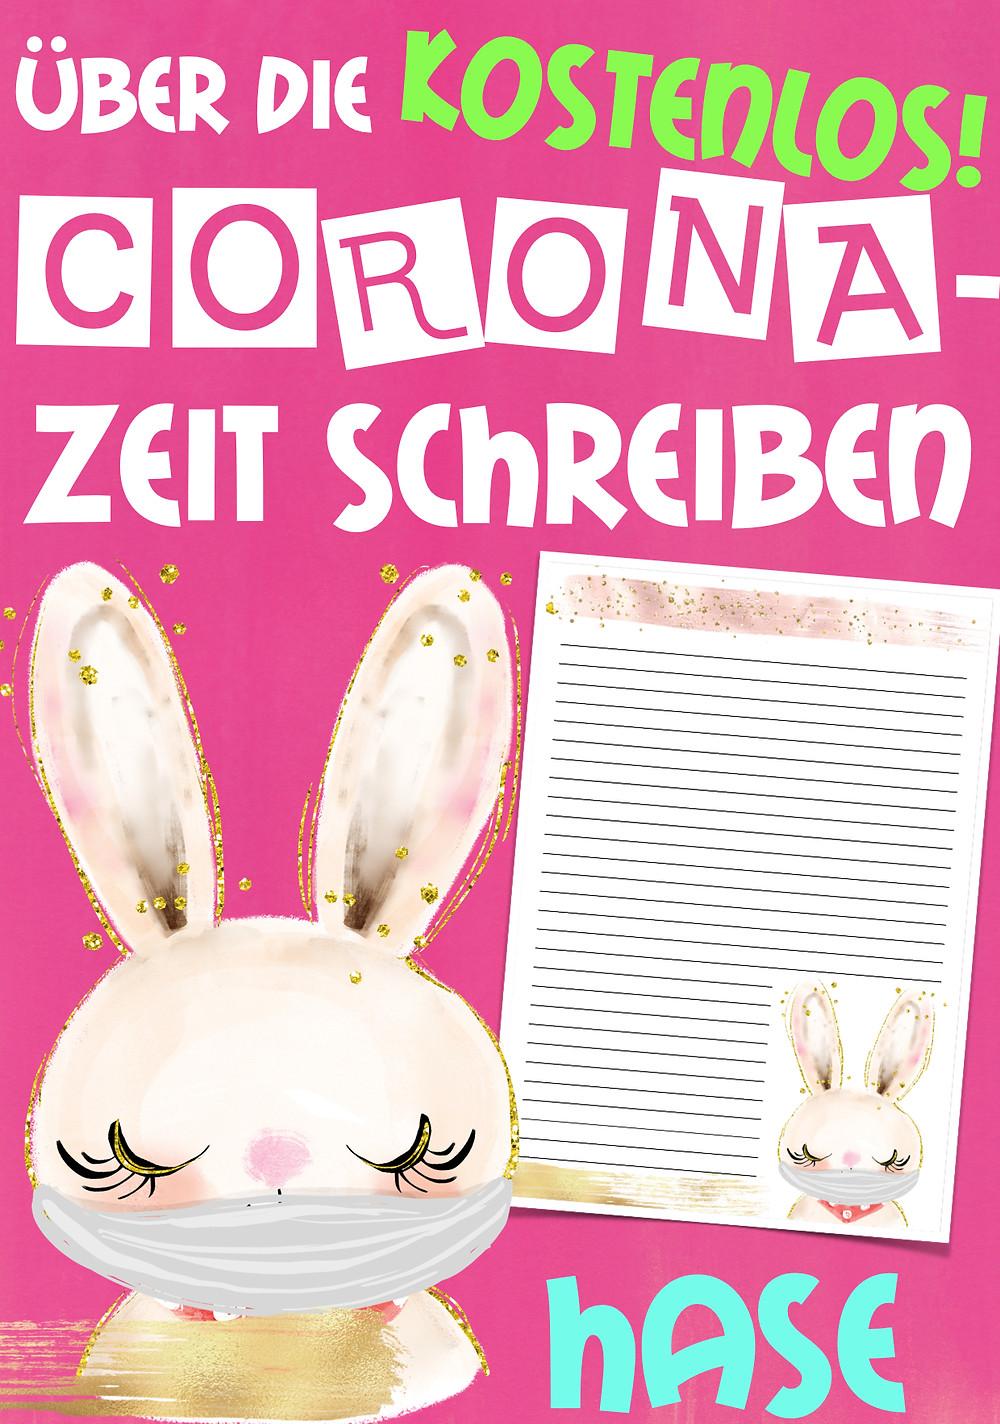 Hase mit Corona Gesichtsmaske Coronavirus Grundschule, Hasenklasse